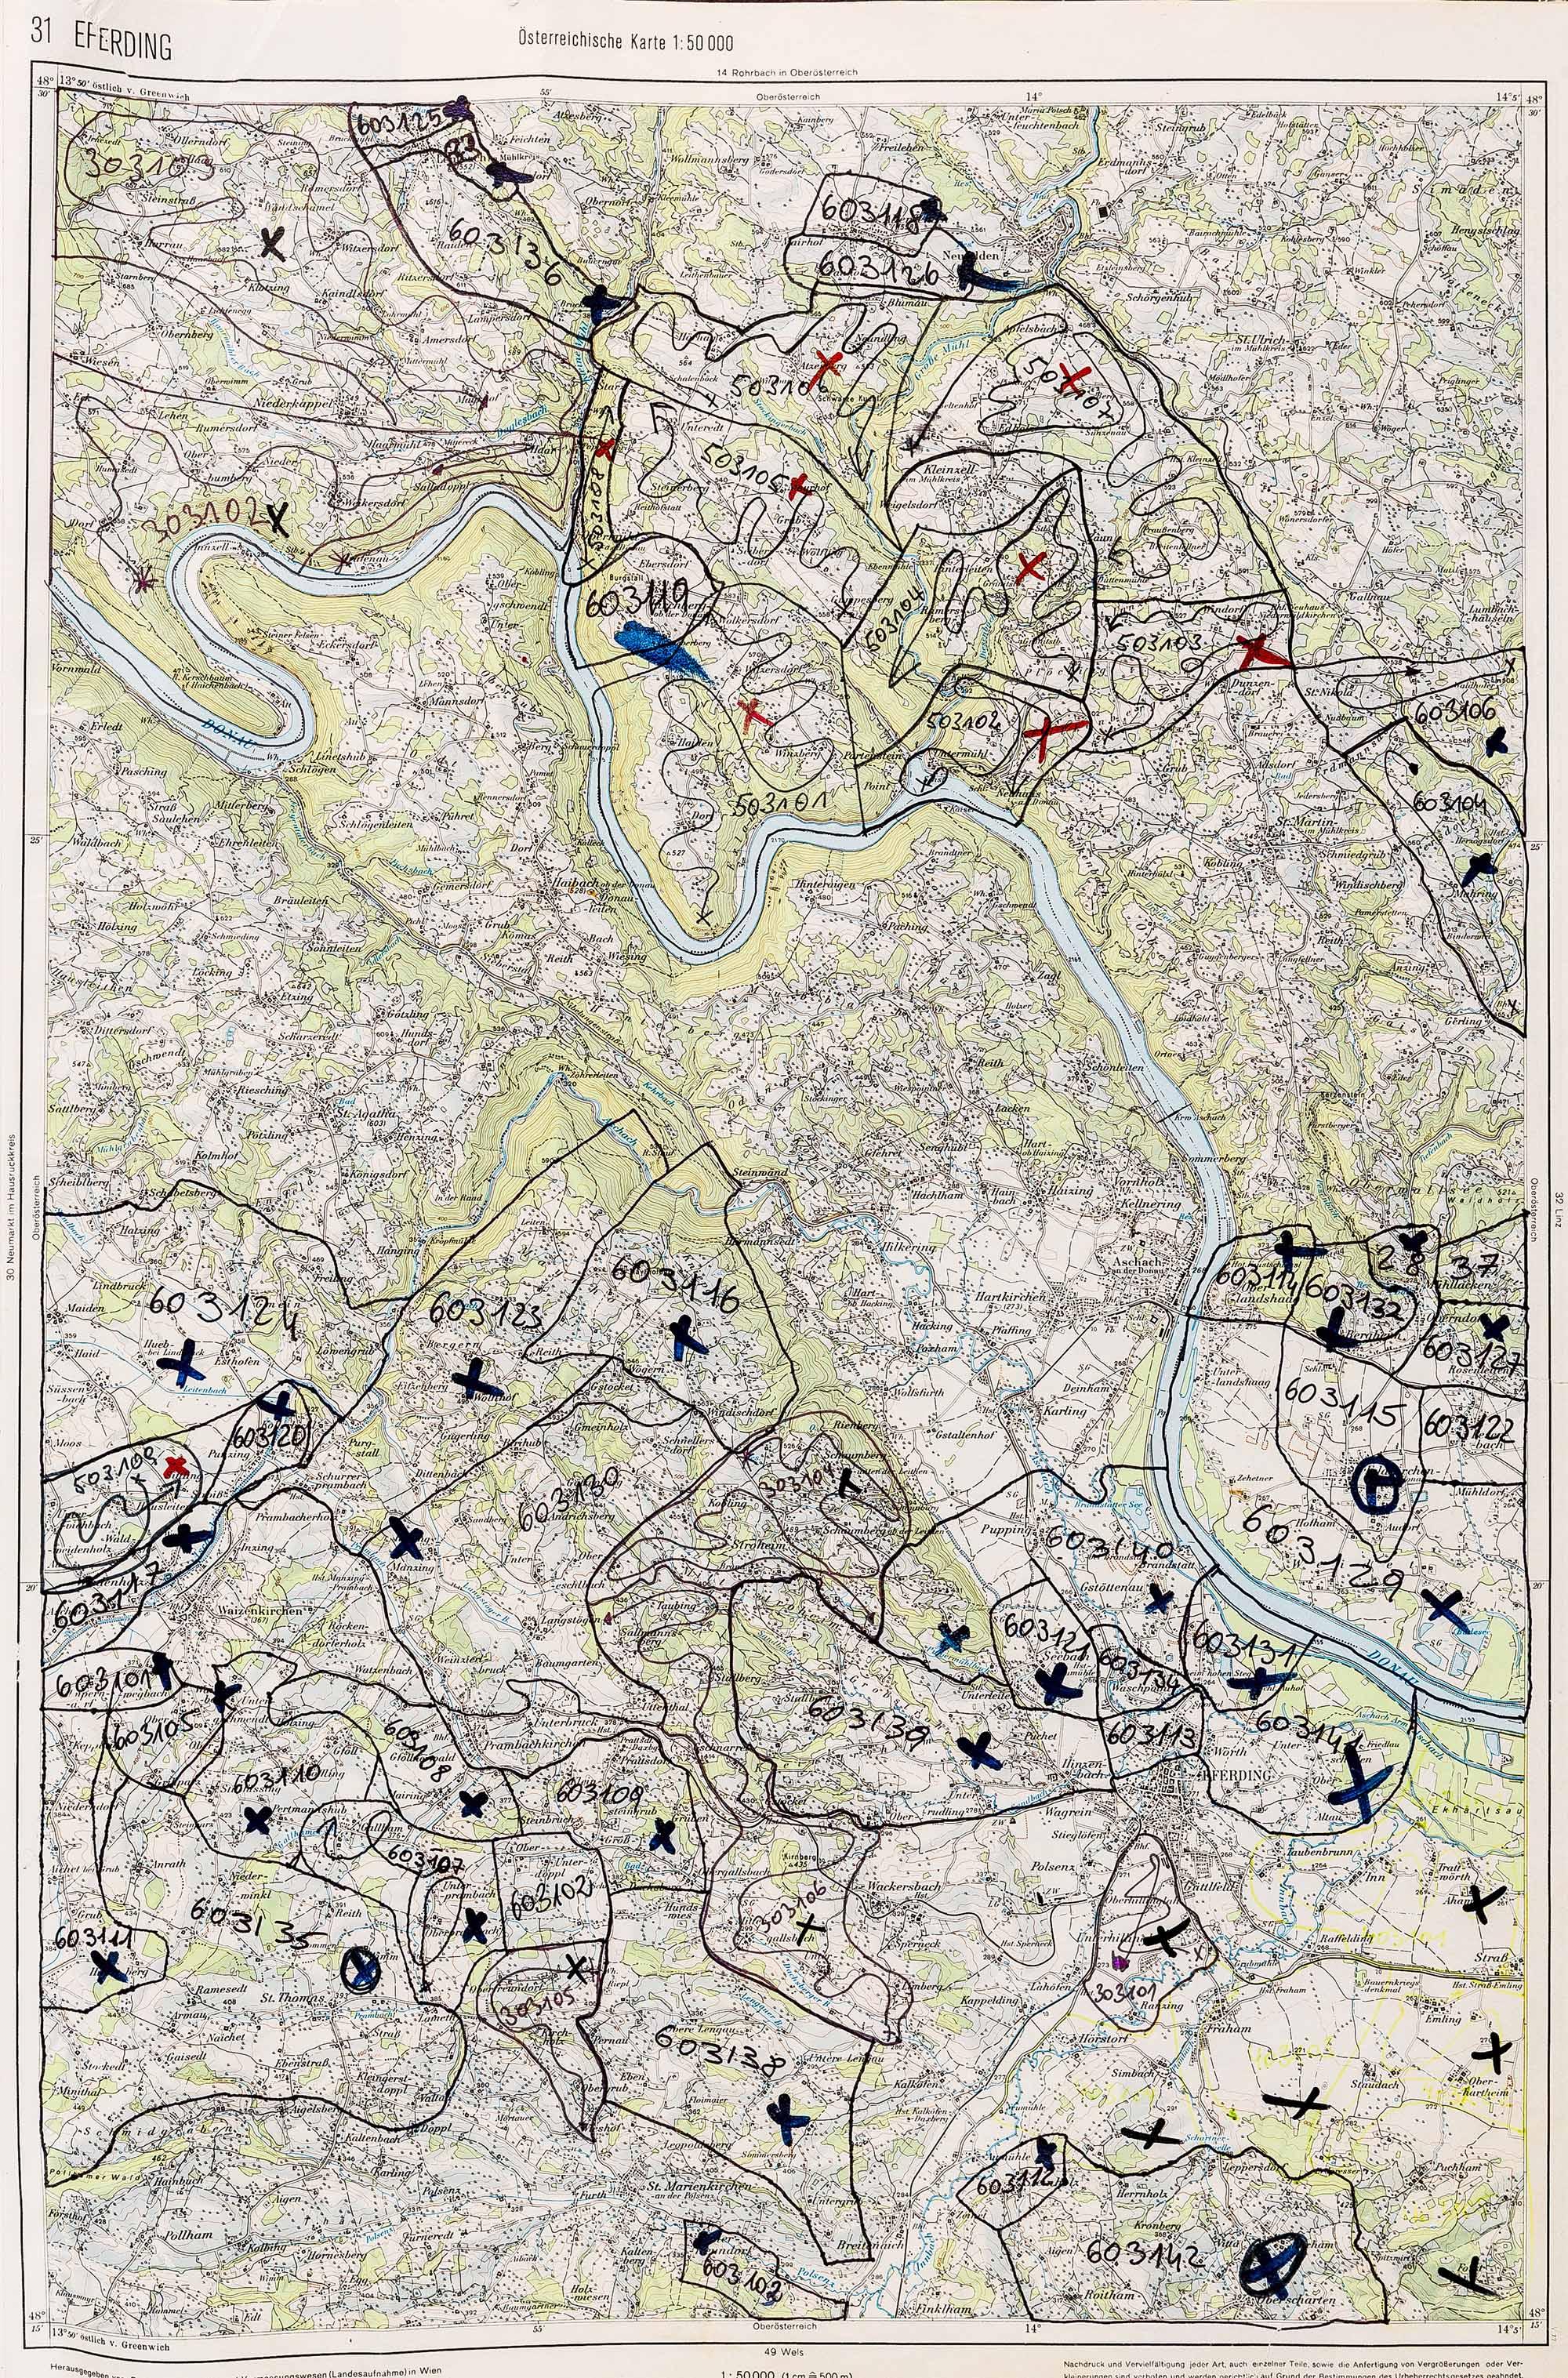 1983-1986 Karte 031